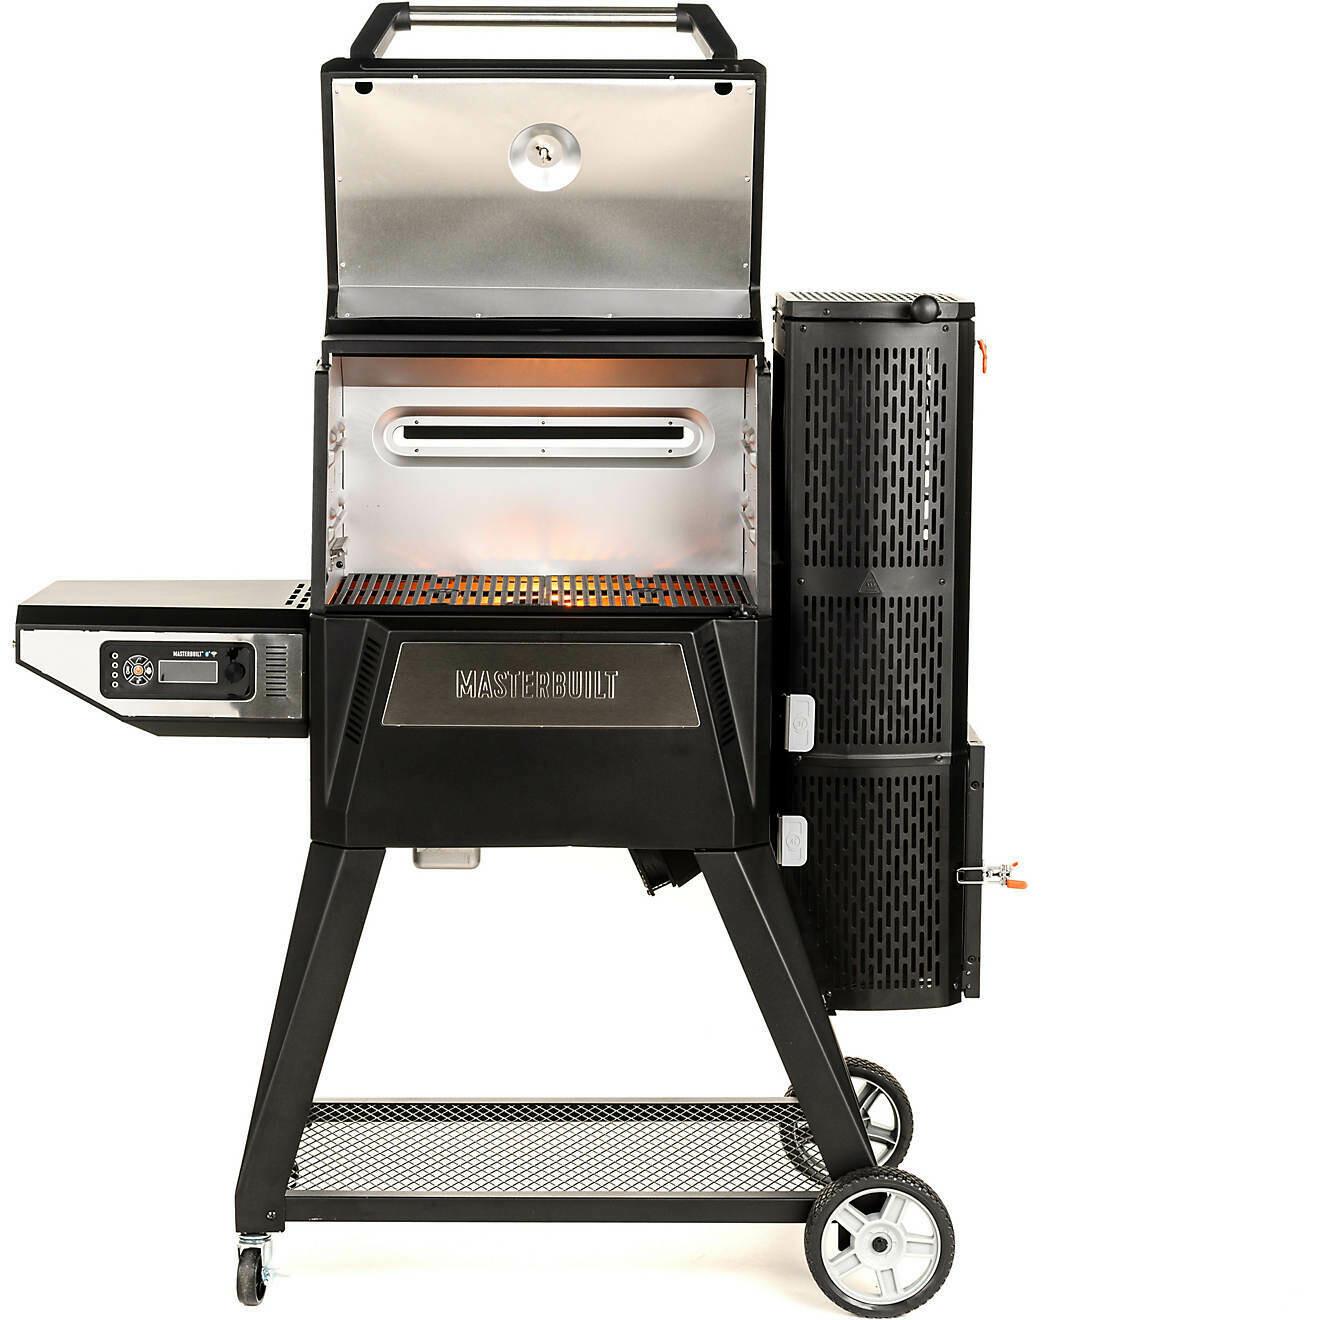 Masterbuilt Gravity Series 560 Digital Charcoal Grill & Smoker